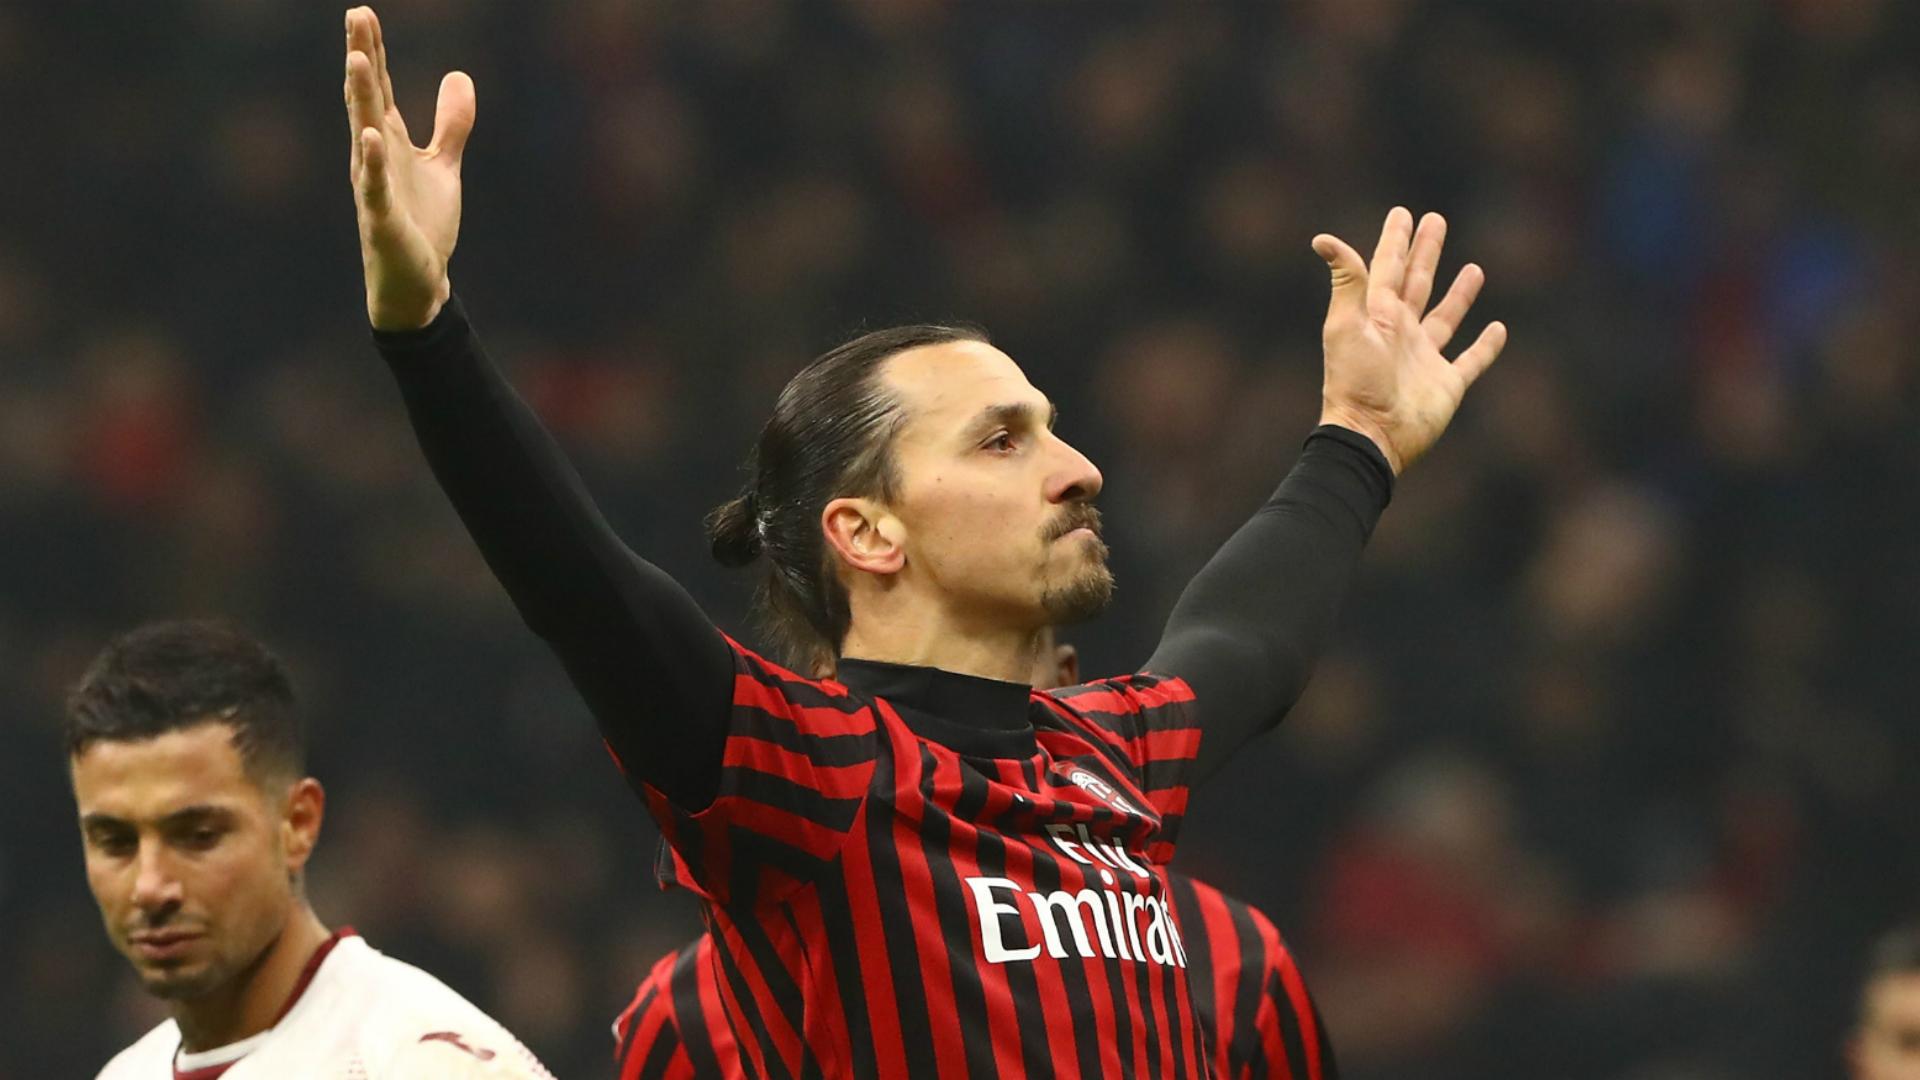 'Sensational' Zlatan Ibrahimovic could trigger new era of Milan glory, says Cafu